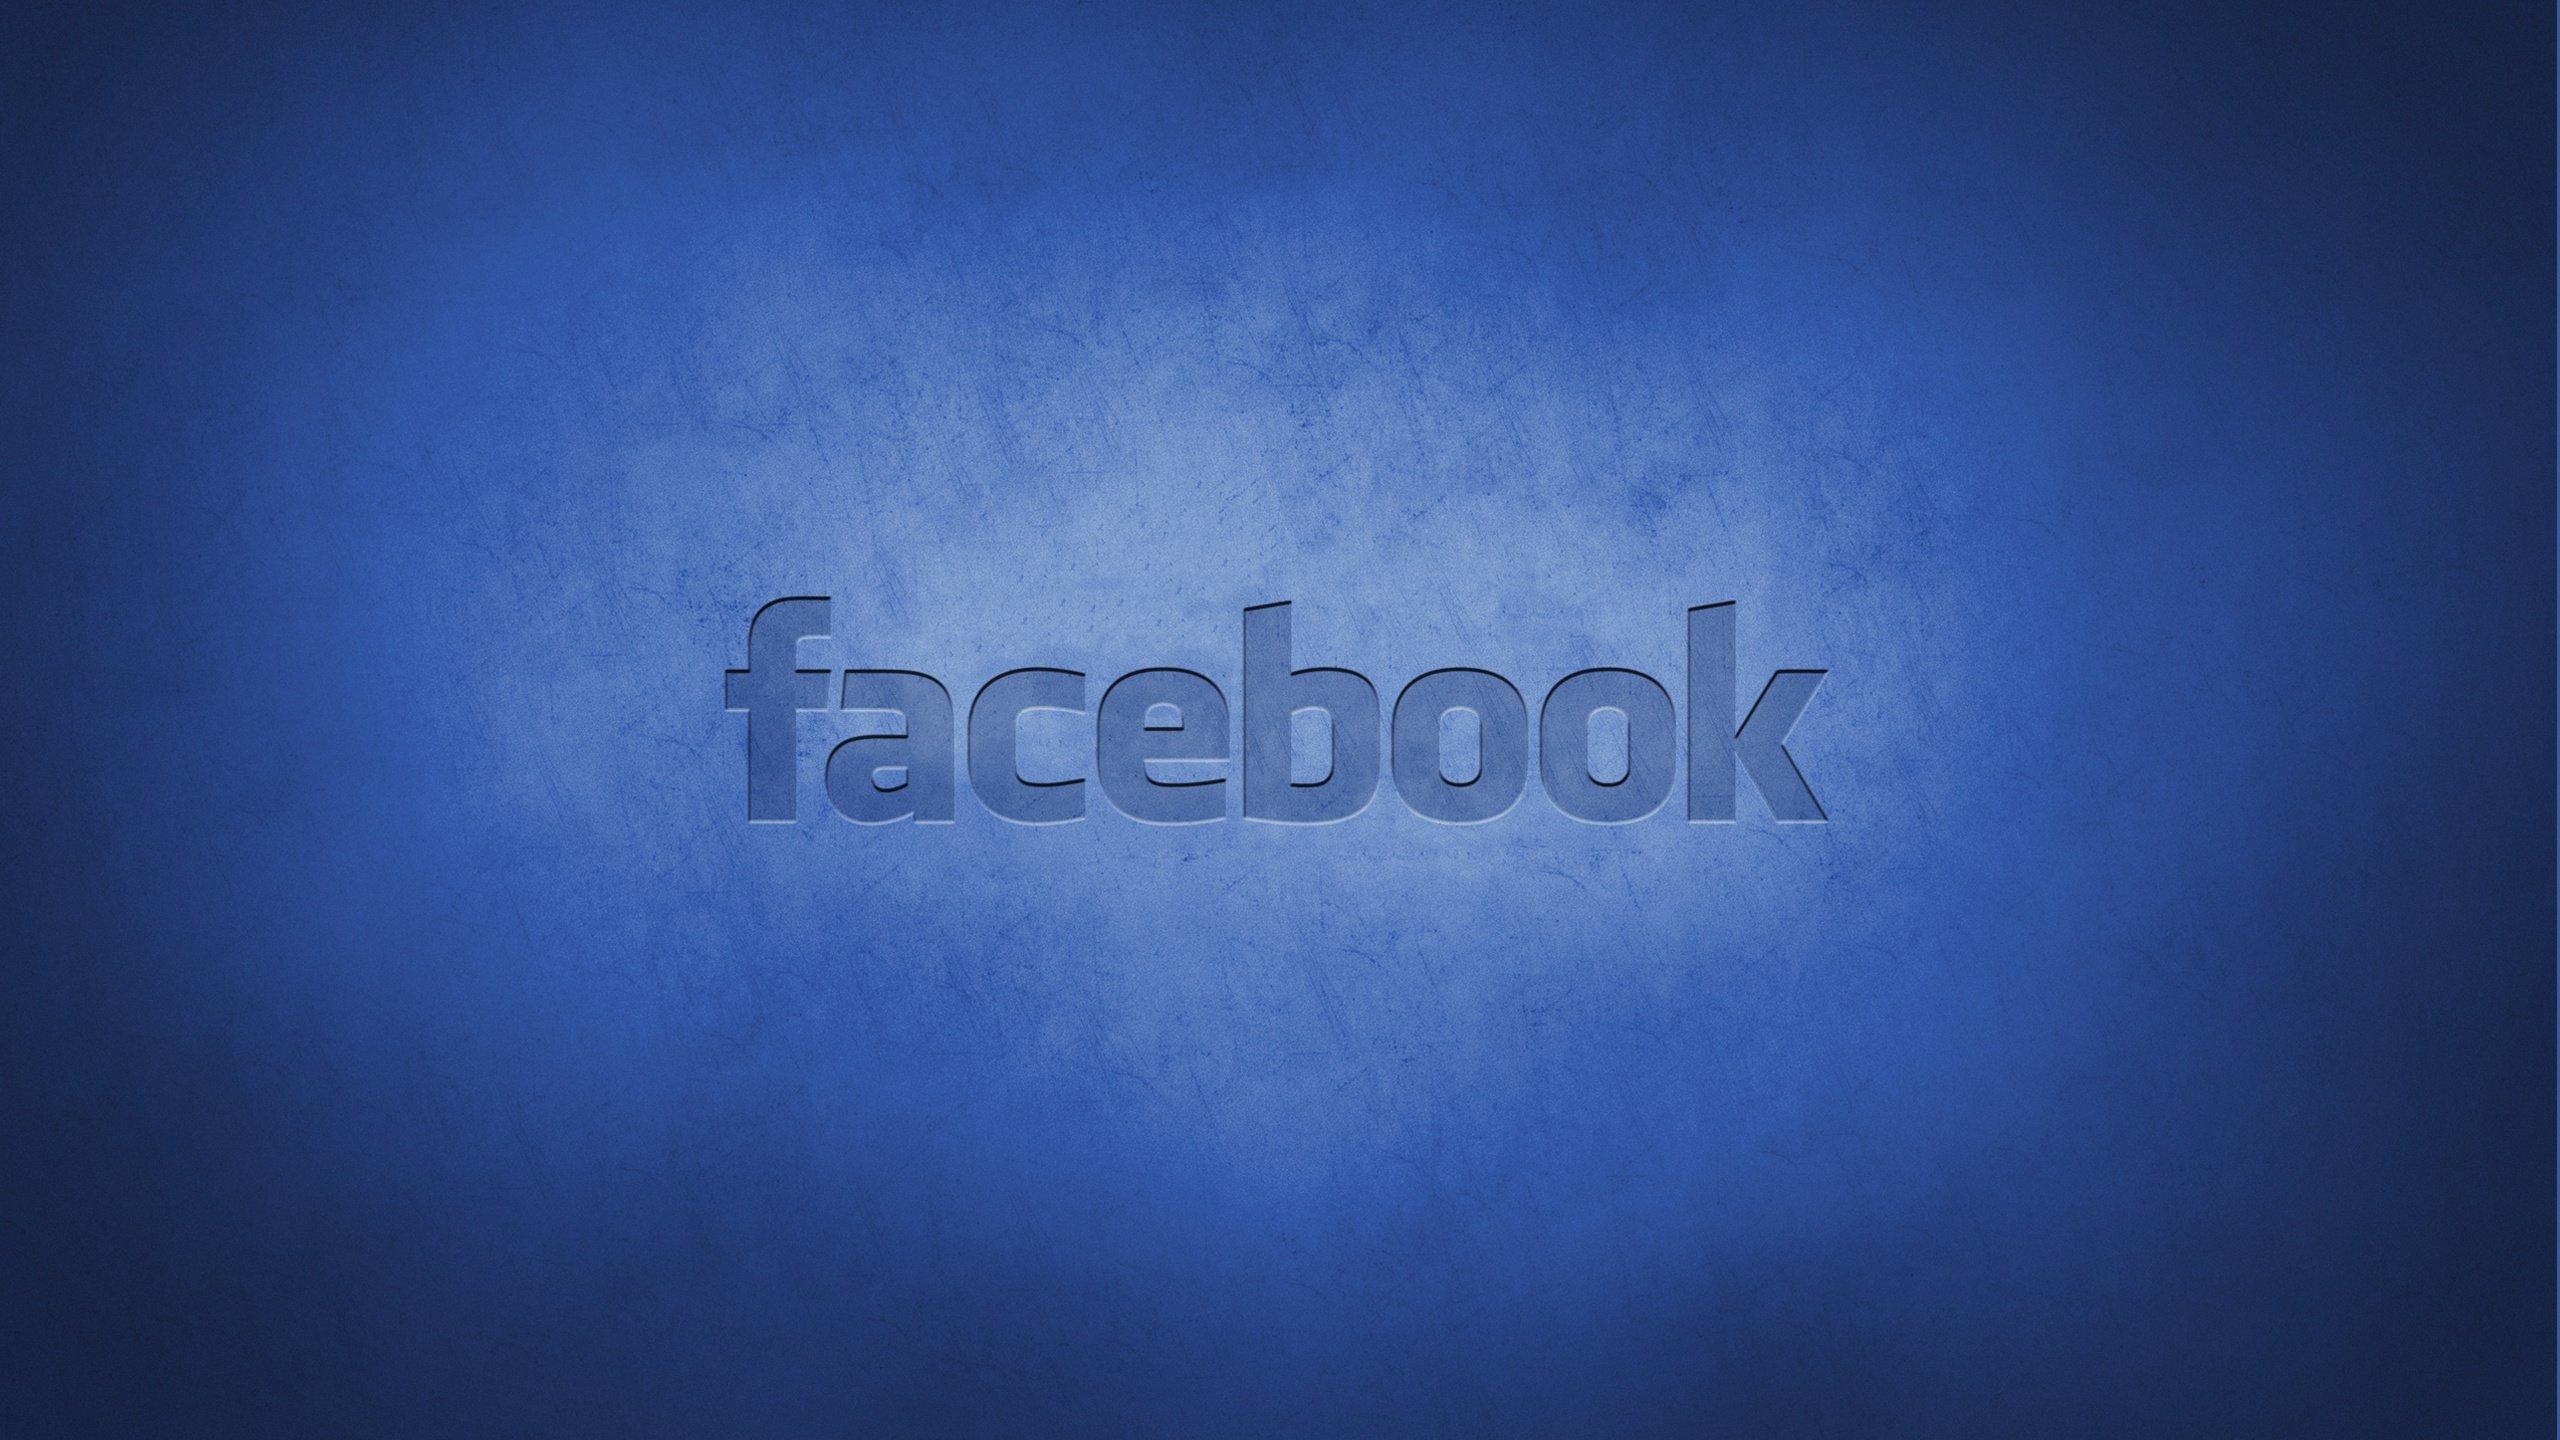 record: תוך 24 שעות: פייסבוק תשלם אם לא תסיר תוכן מדווח cover image